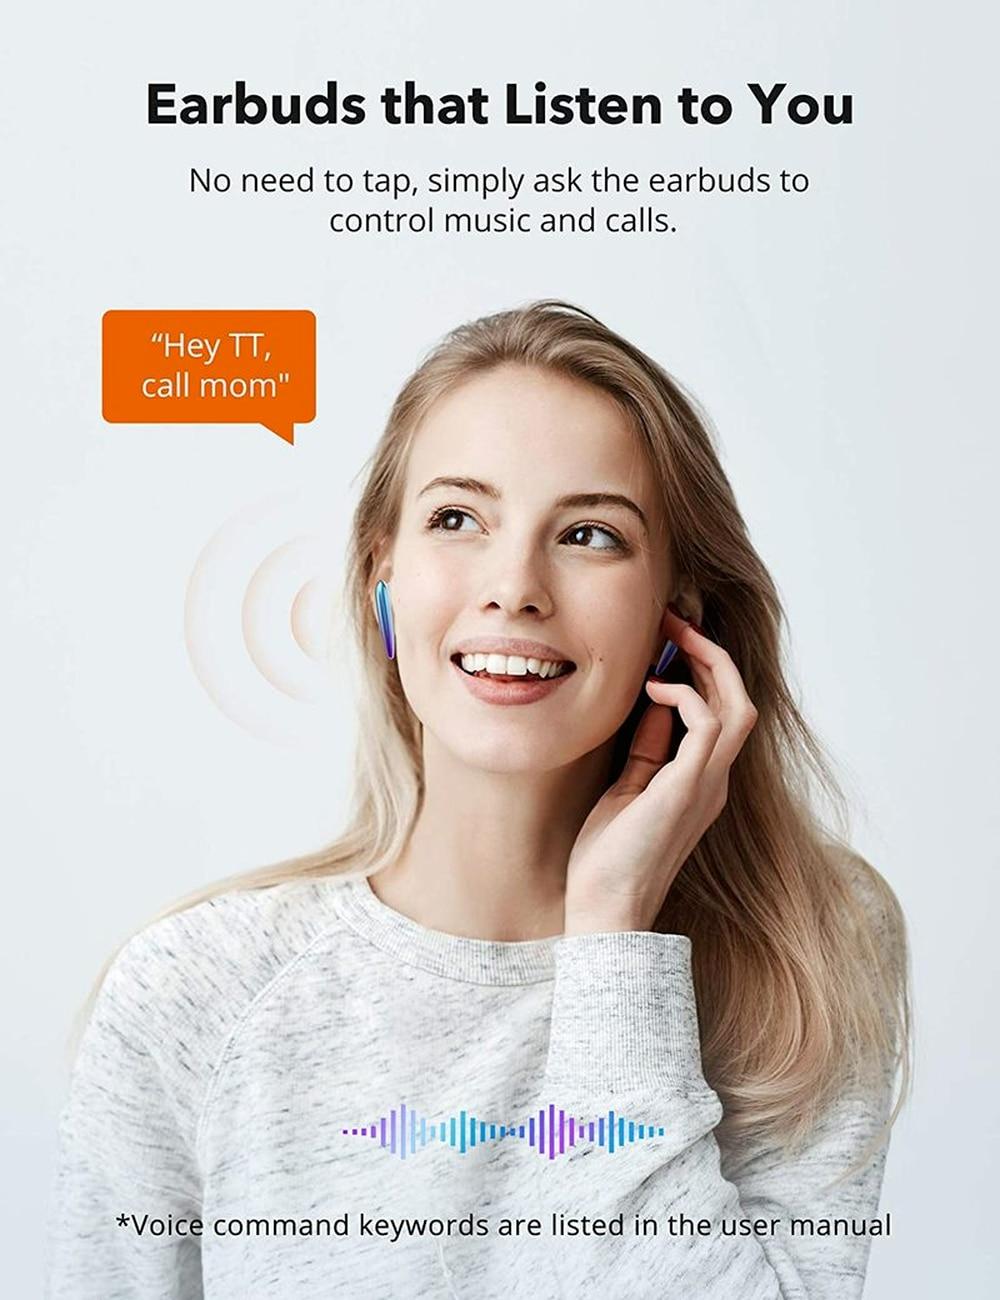 TaoTronics SoundLiberty 80 Bluetooth Earphones Wireless Earbuds TWS AptX IPX7 Waterproof Earphone with AI Noise Canceling Mic enlarge